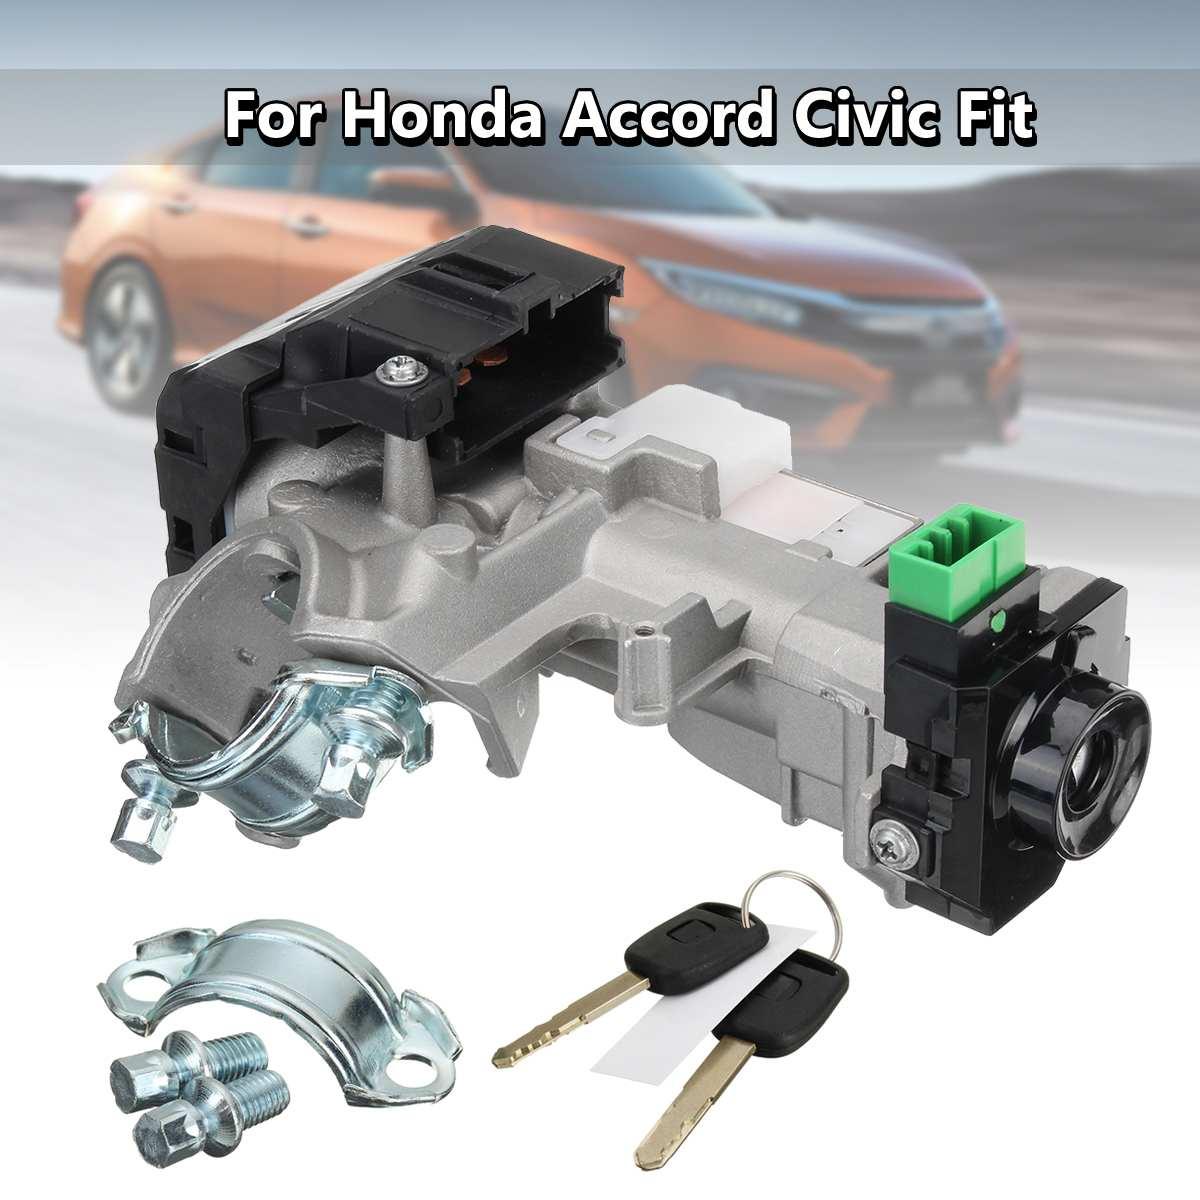 Ignition Switch Cylinder Lock Auto Trans 2 Keys for Honda for Accord Civic 2003 2004 2005Ignition Switch Cylinder Lock Auto Trans 2 Keys for Honda for Accord Civic 2003 2004 2005